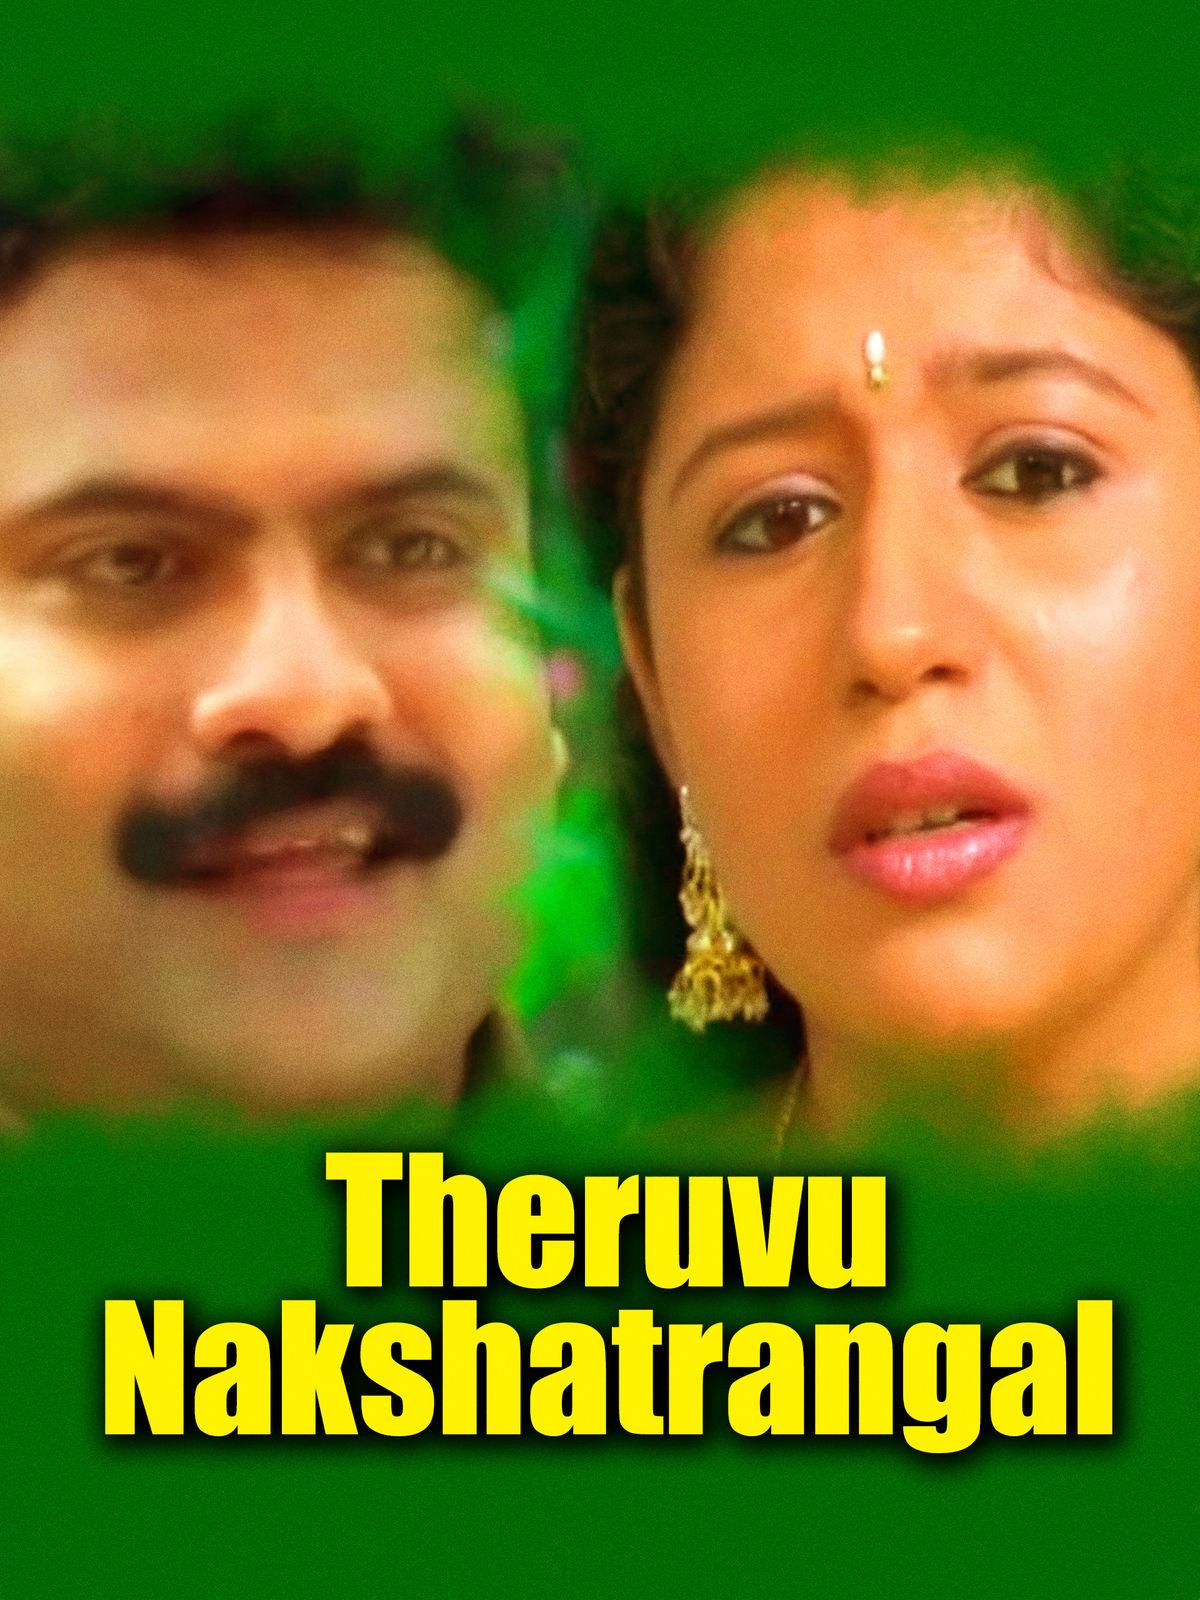 Theruvu Nakshatrangal